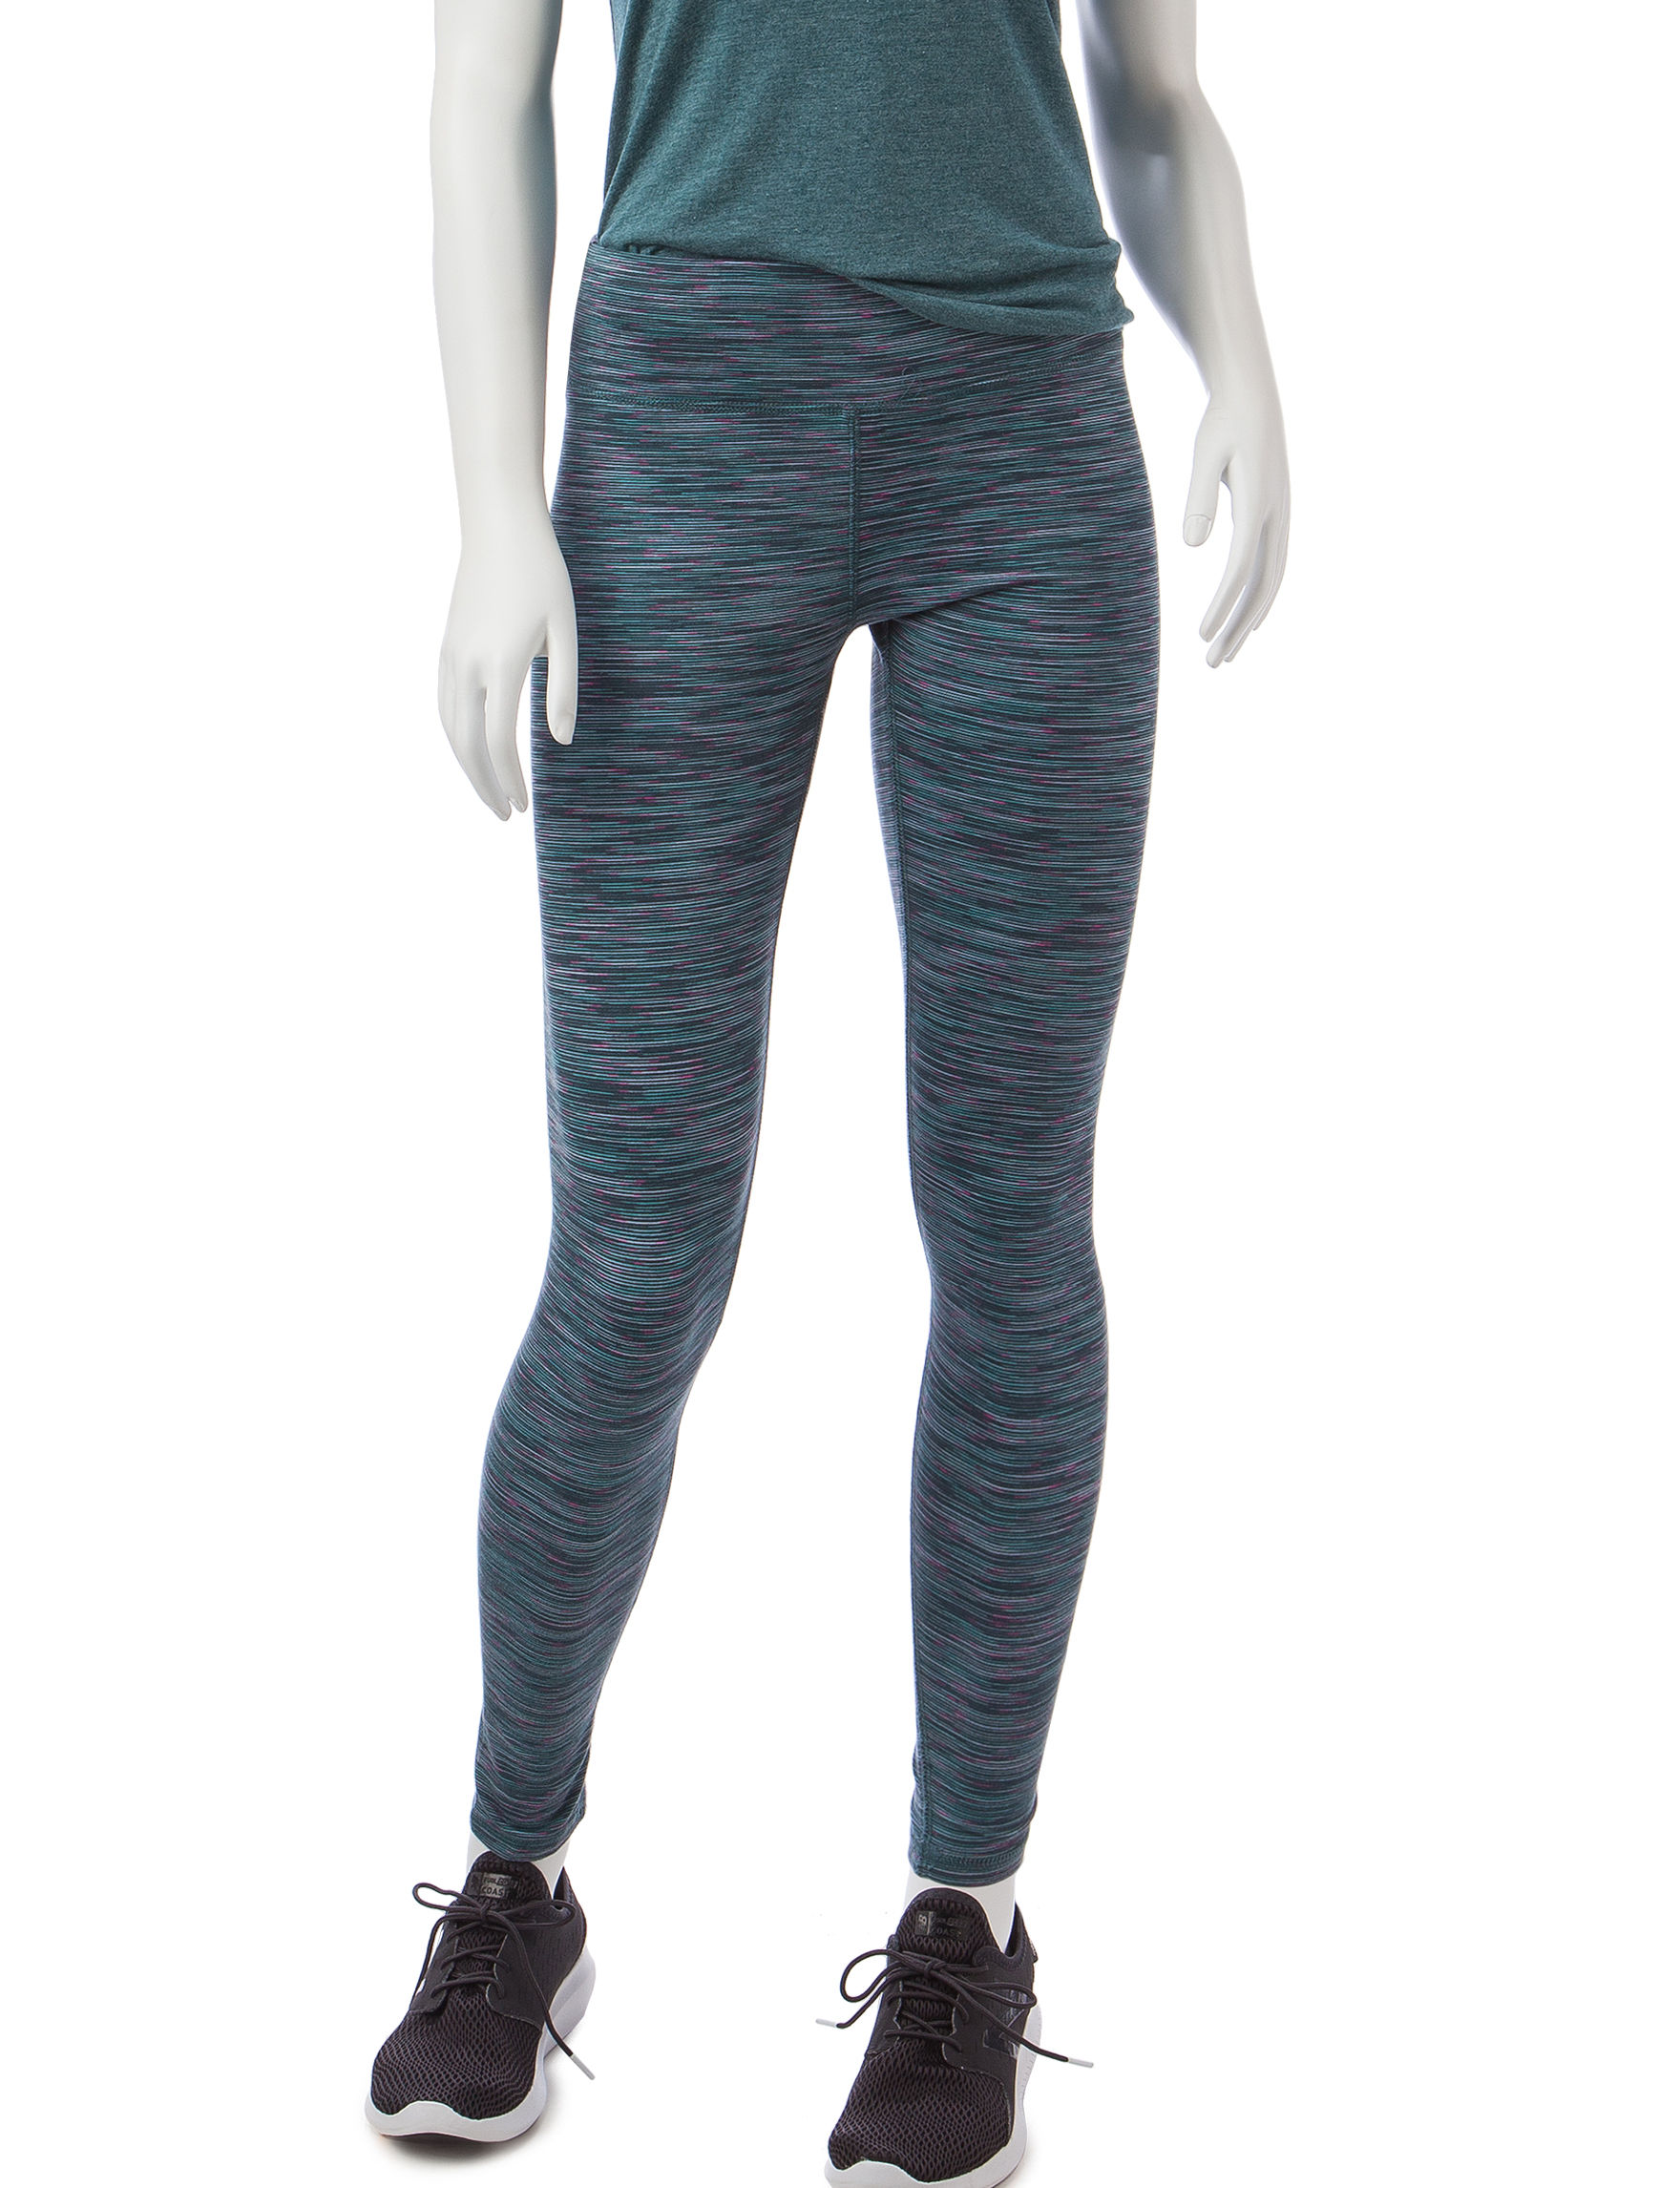 RBX Grey / Blue Leggings